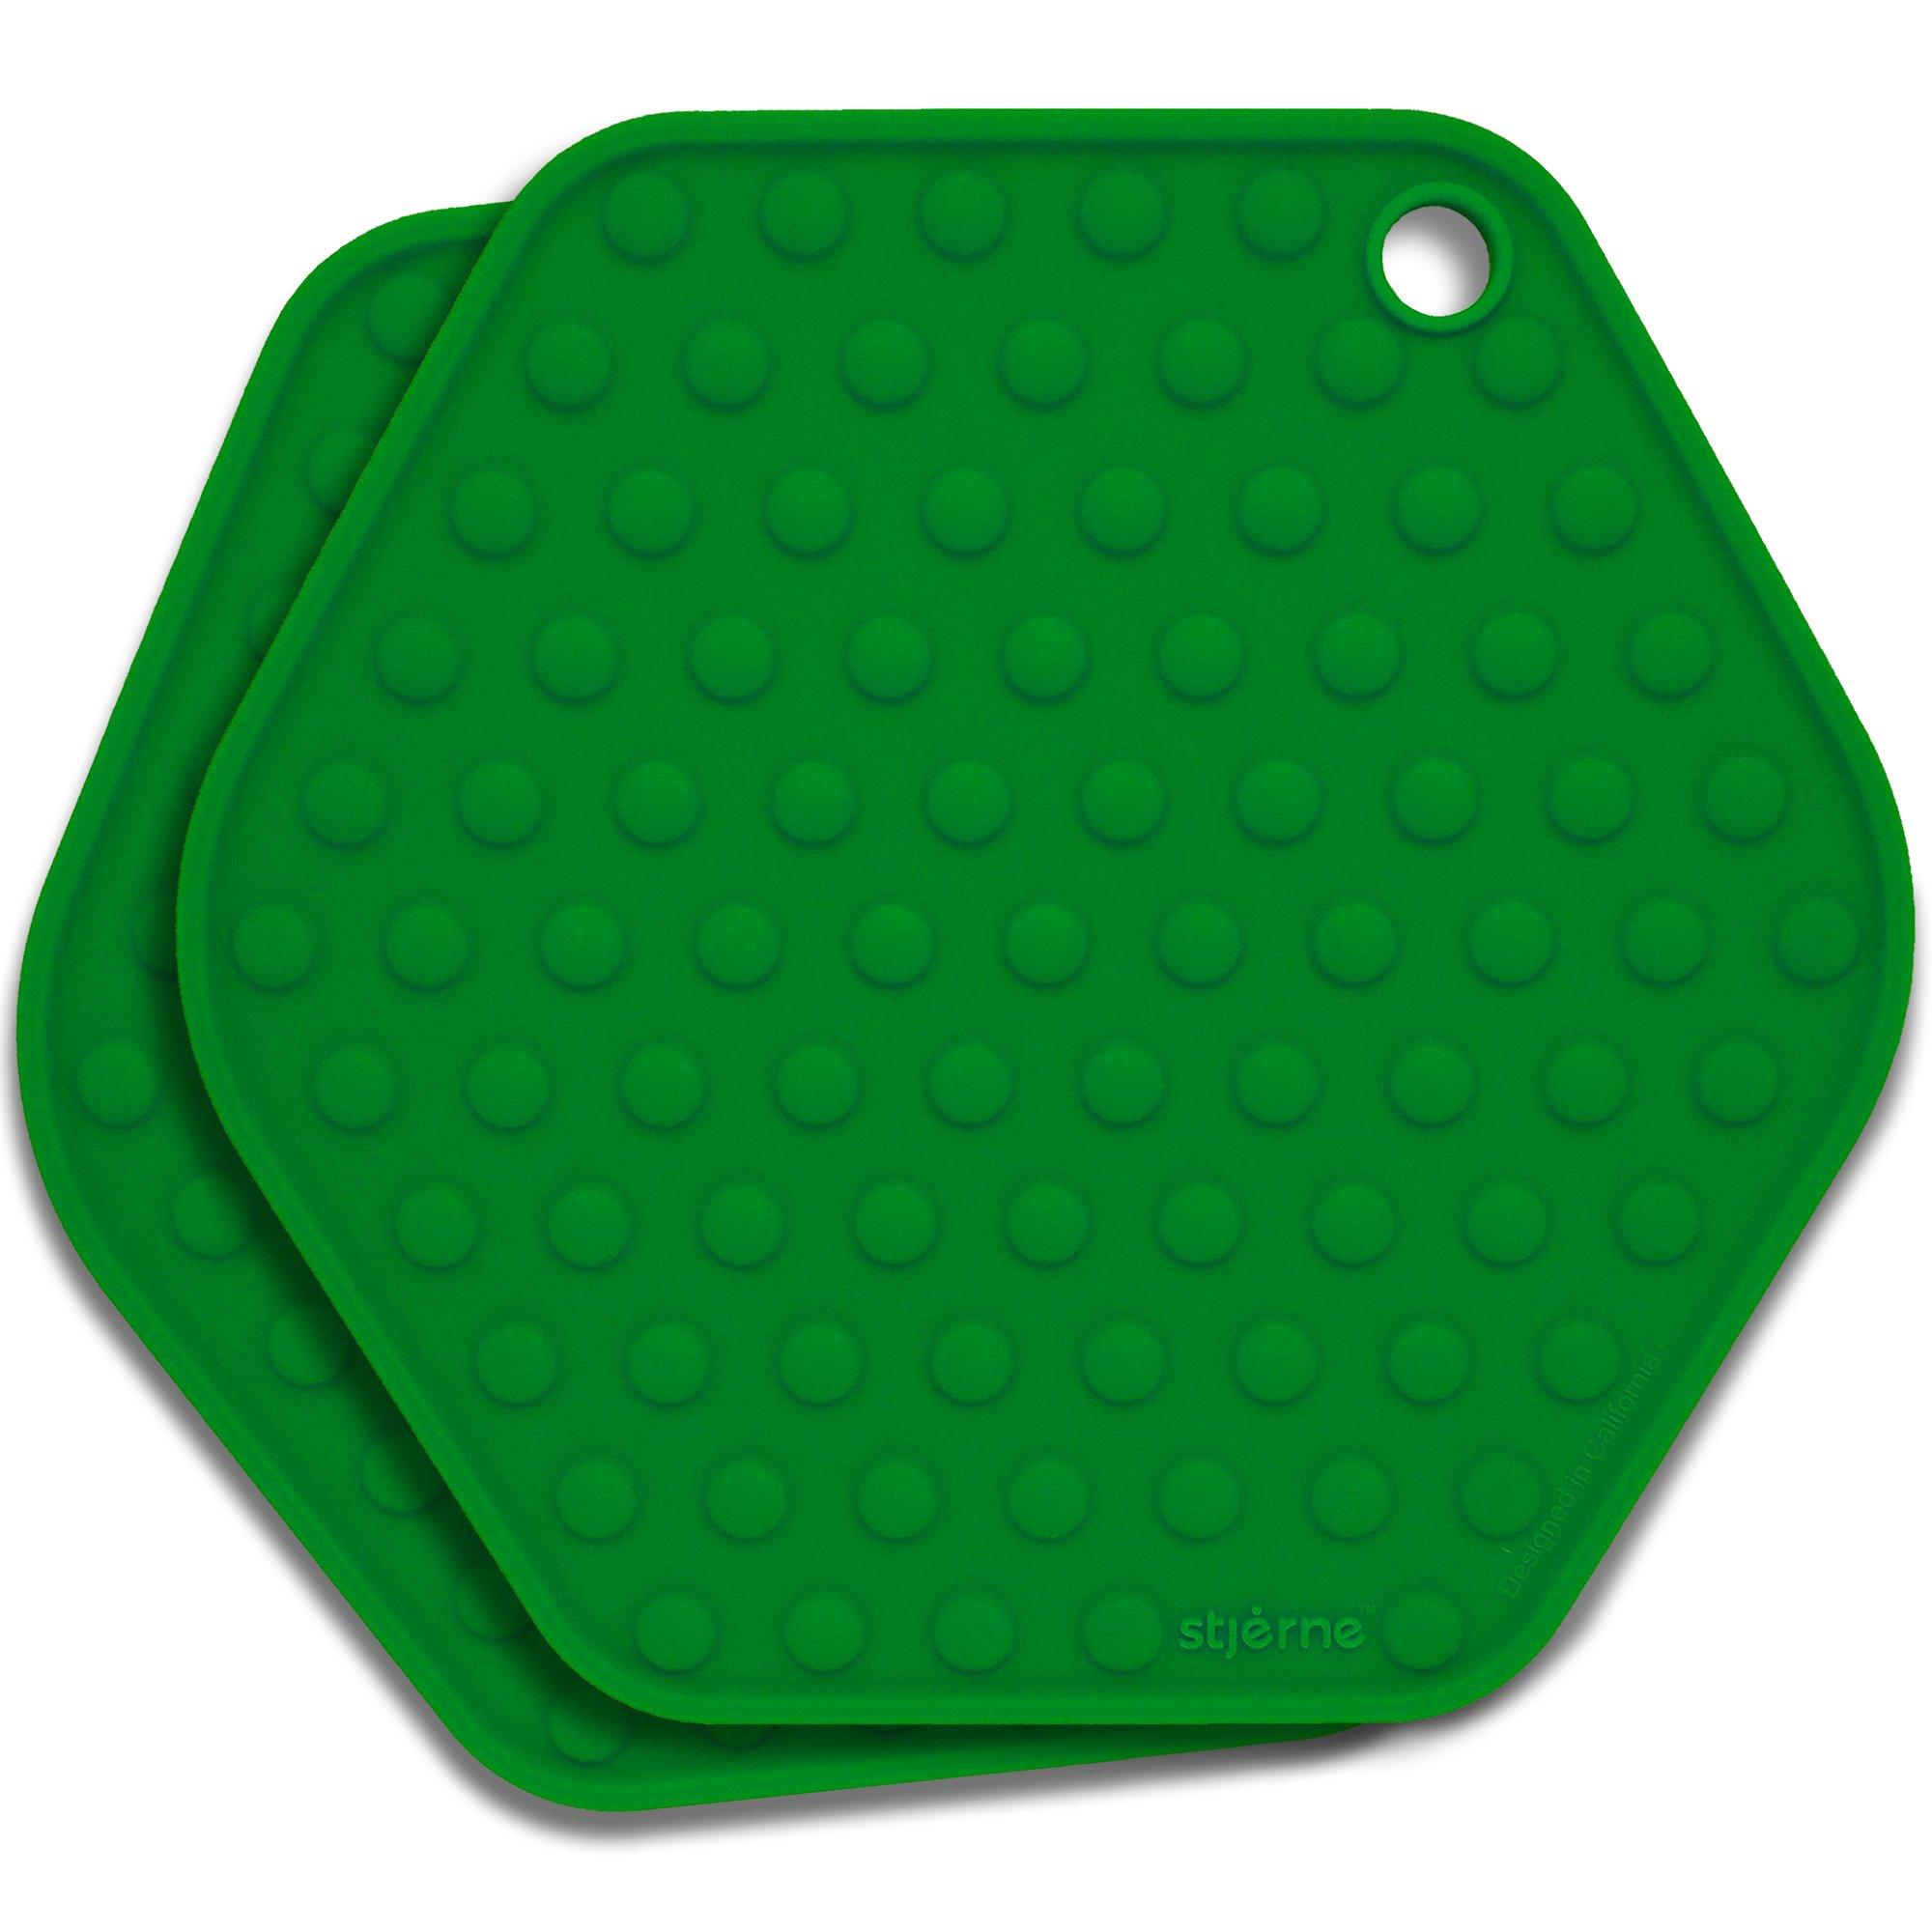 Stjerne Set of 2 Multipurpose Large Silicone Trivets, Mat, Multiple Spoon Rest, Jar Opener, Pot Holder, Coaster, 5-in-1, Heavy Duty & Flexible (Emerald)